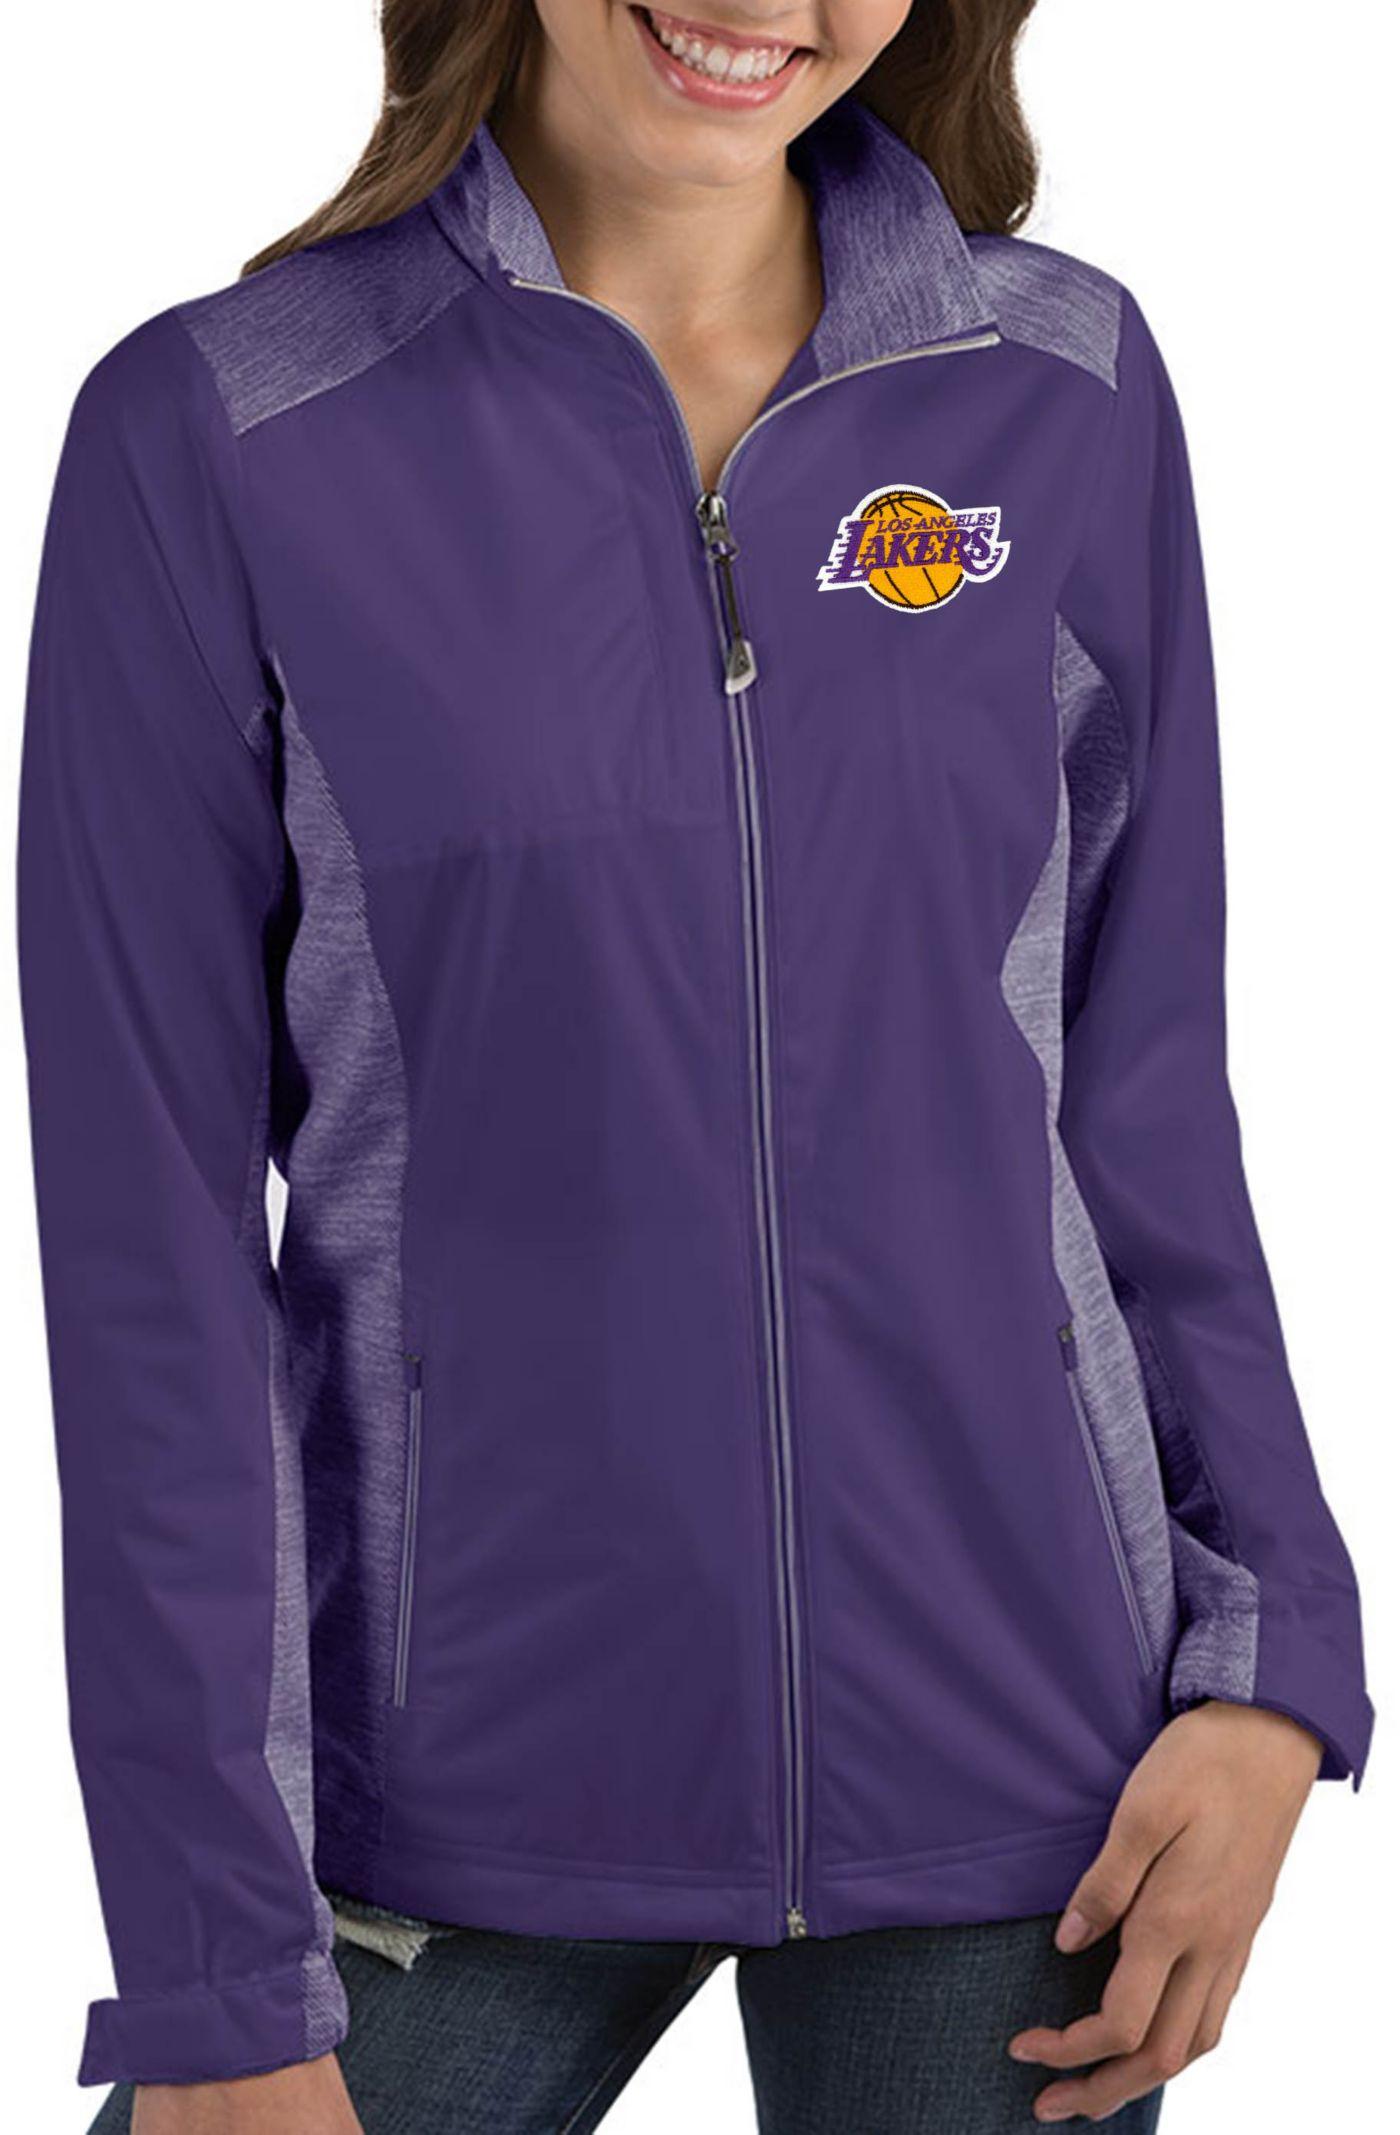 Antigua Women's Los Angeles Lakers Revolve Full-Zip Jacket